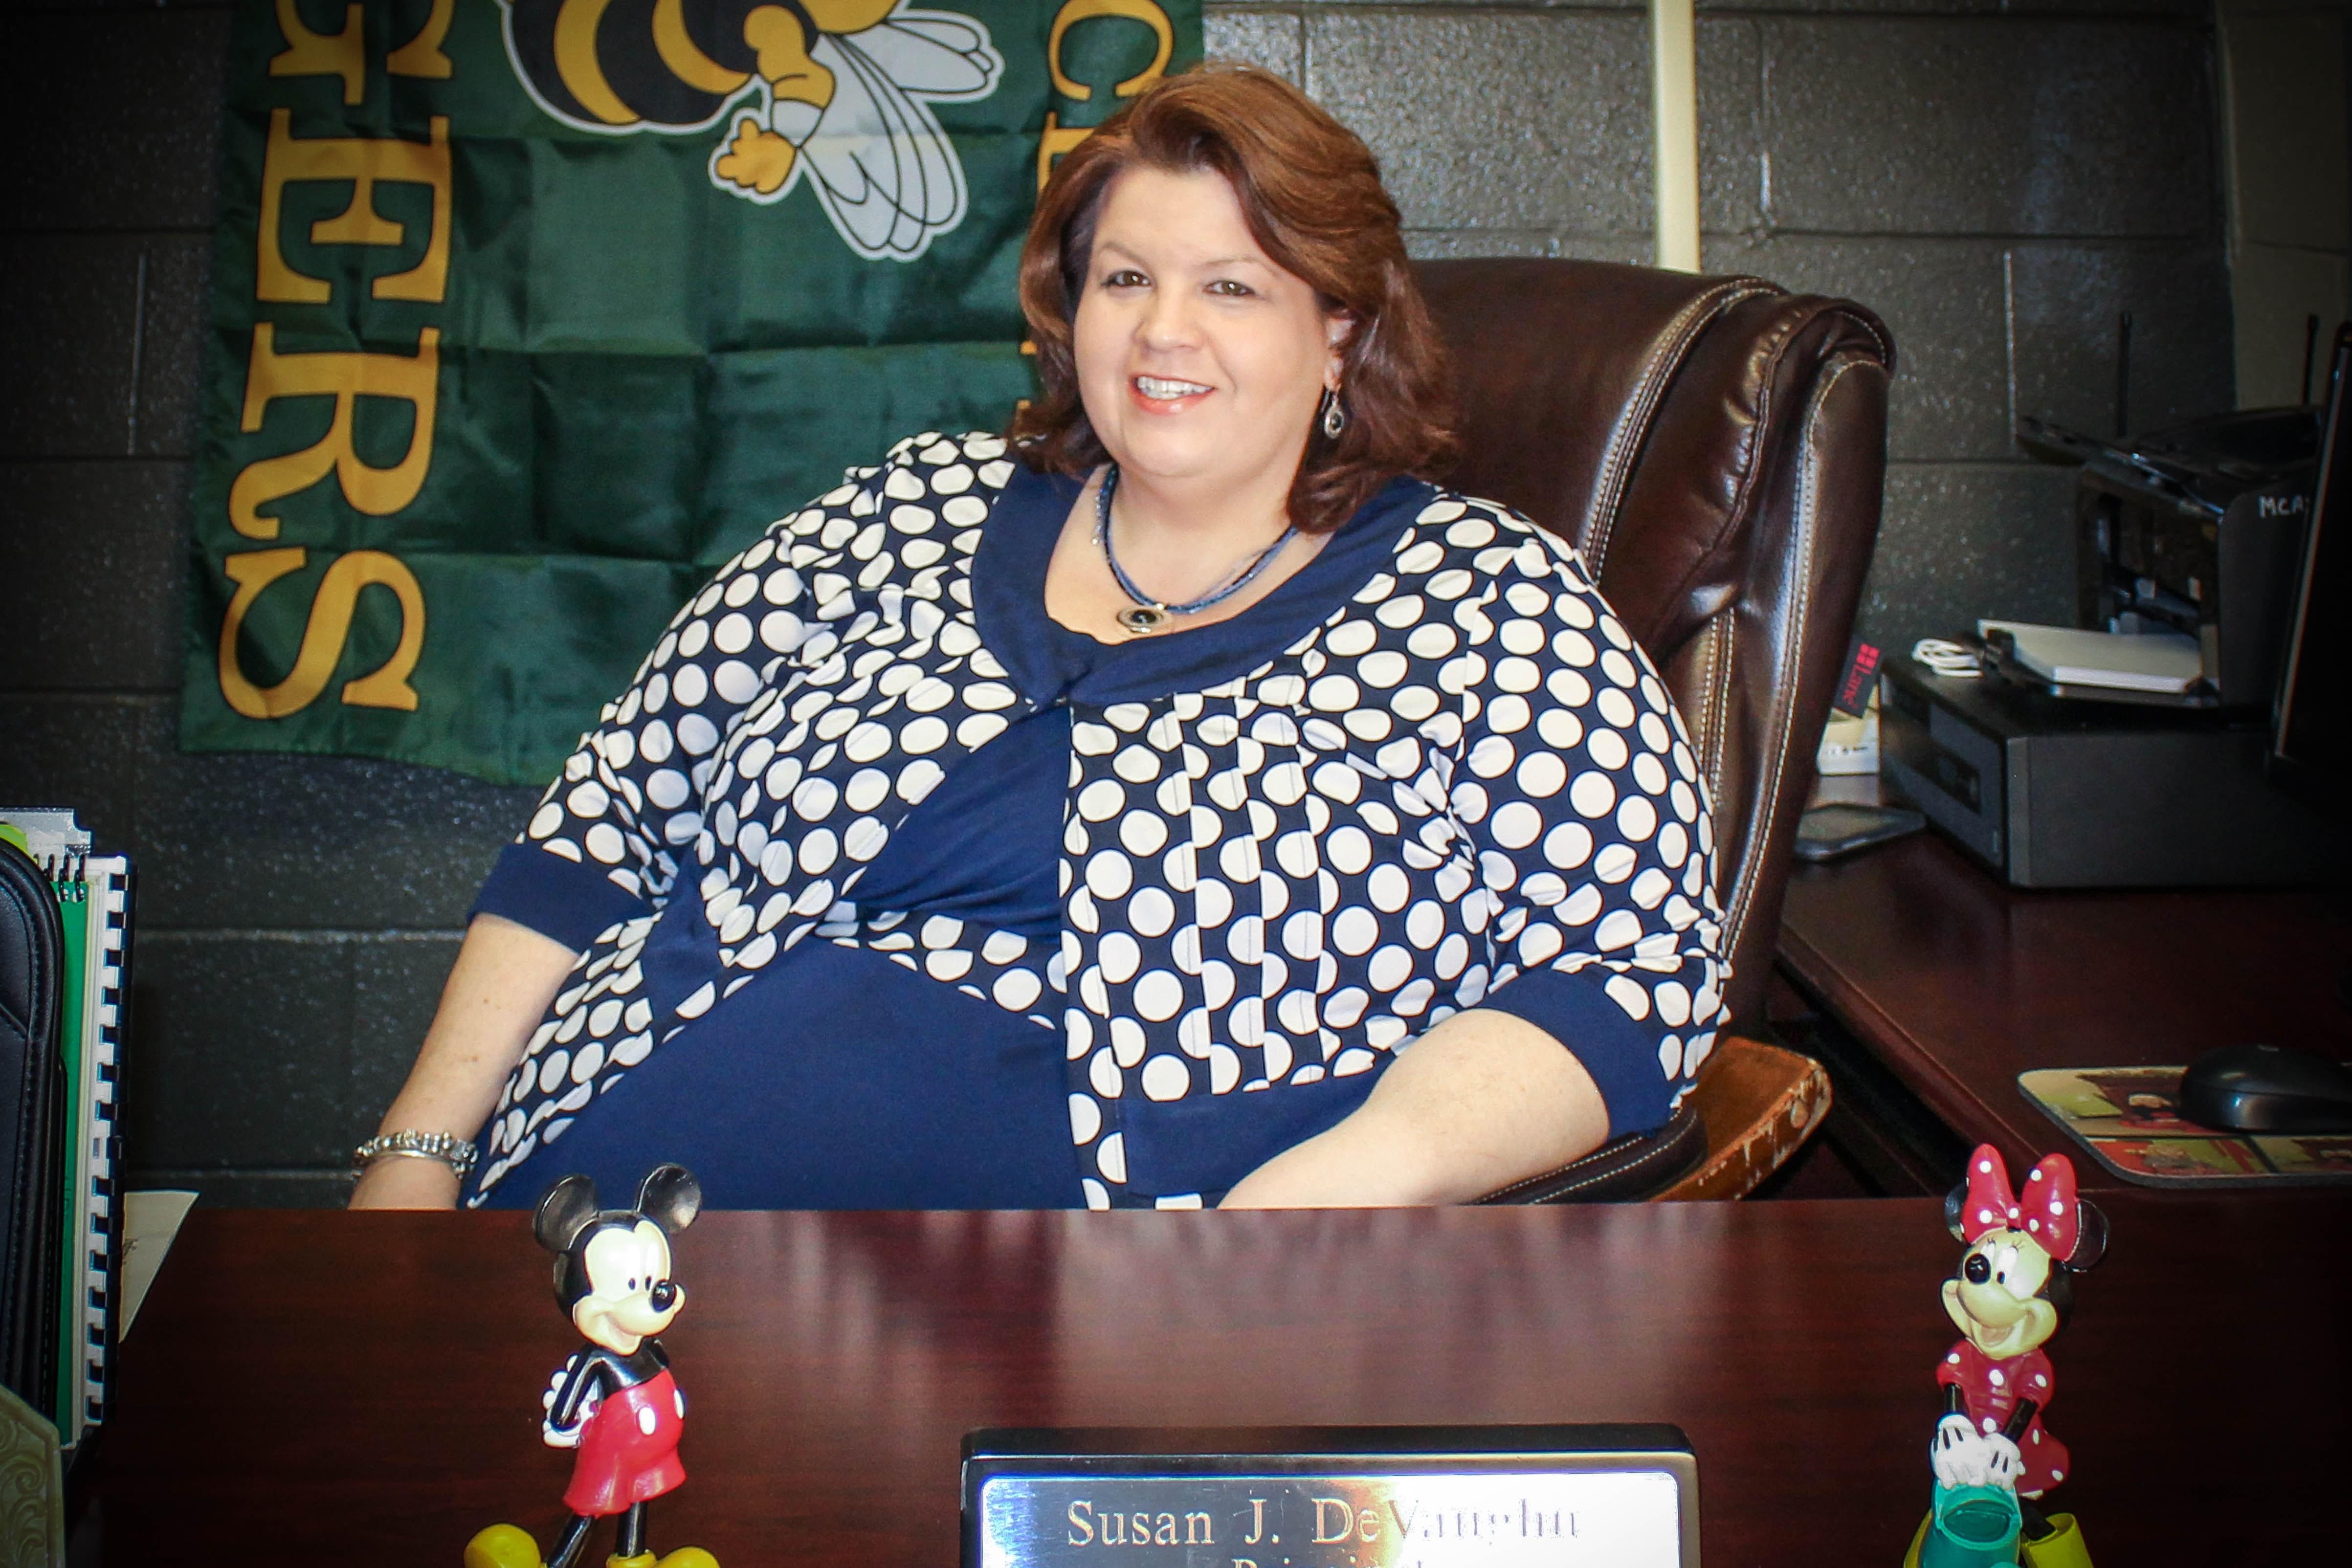 Rayne Elementary Principal, Mrs. Susan DeVaughn